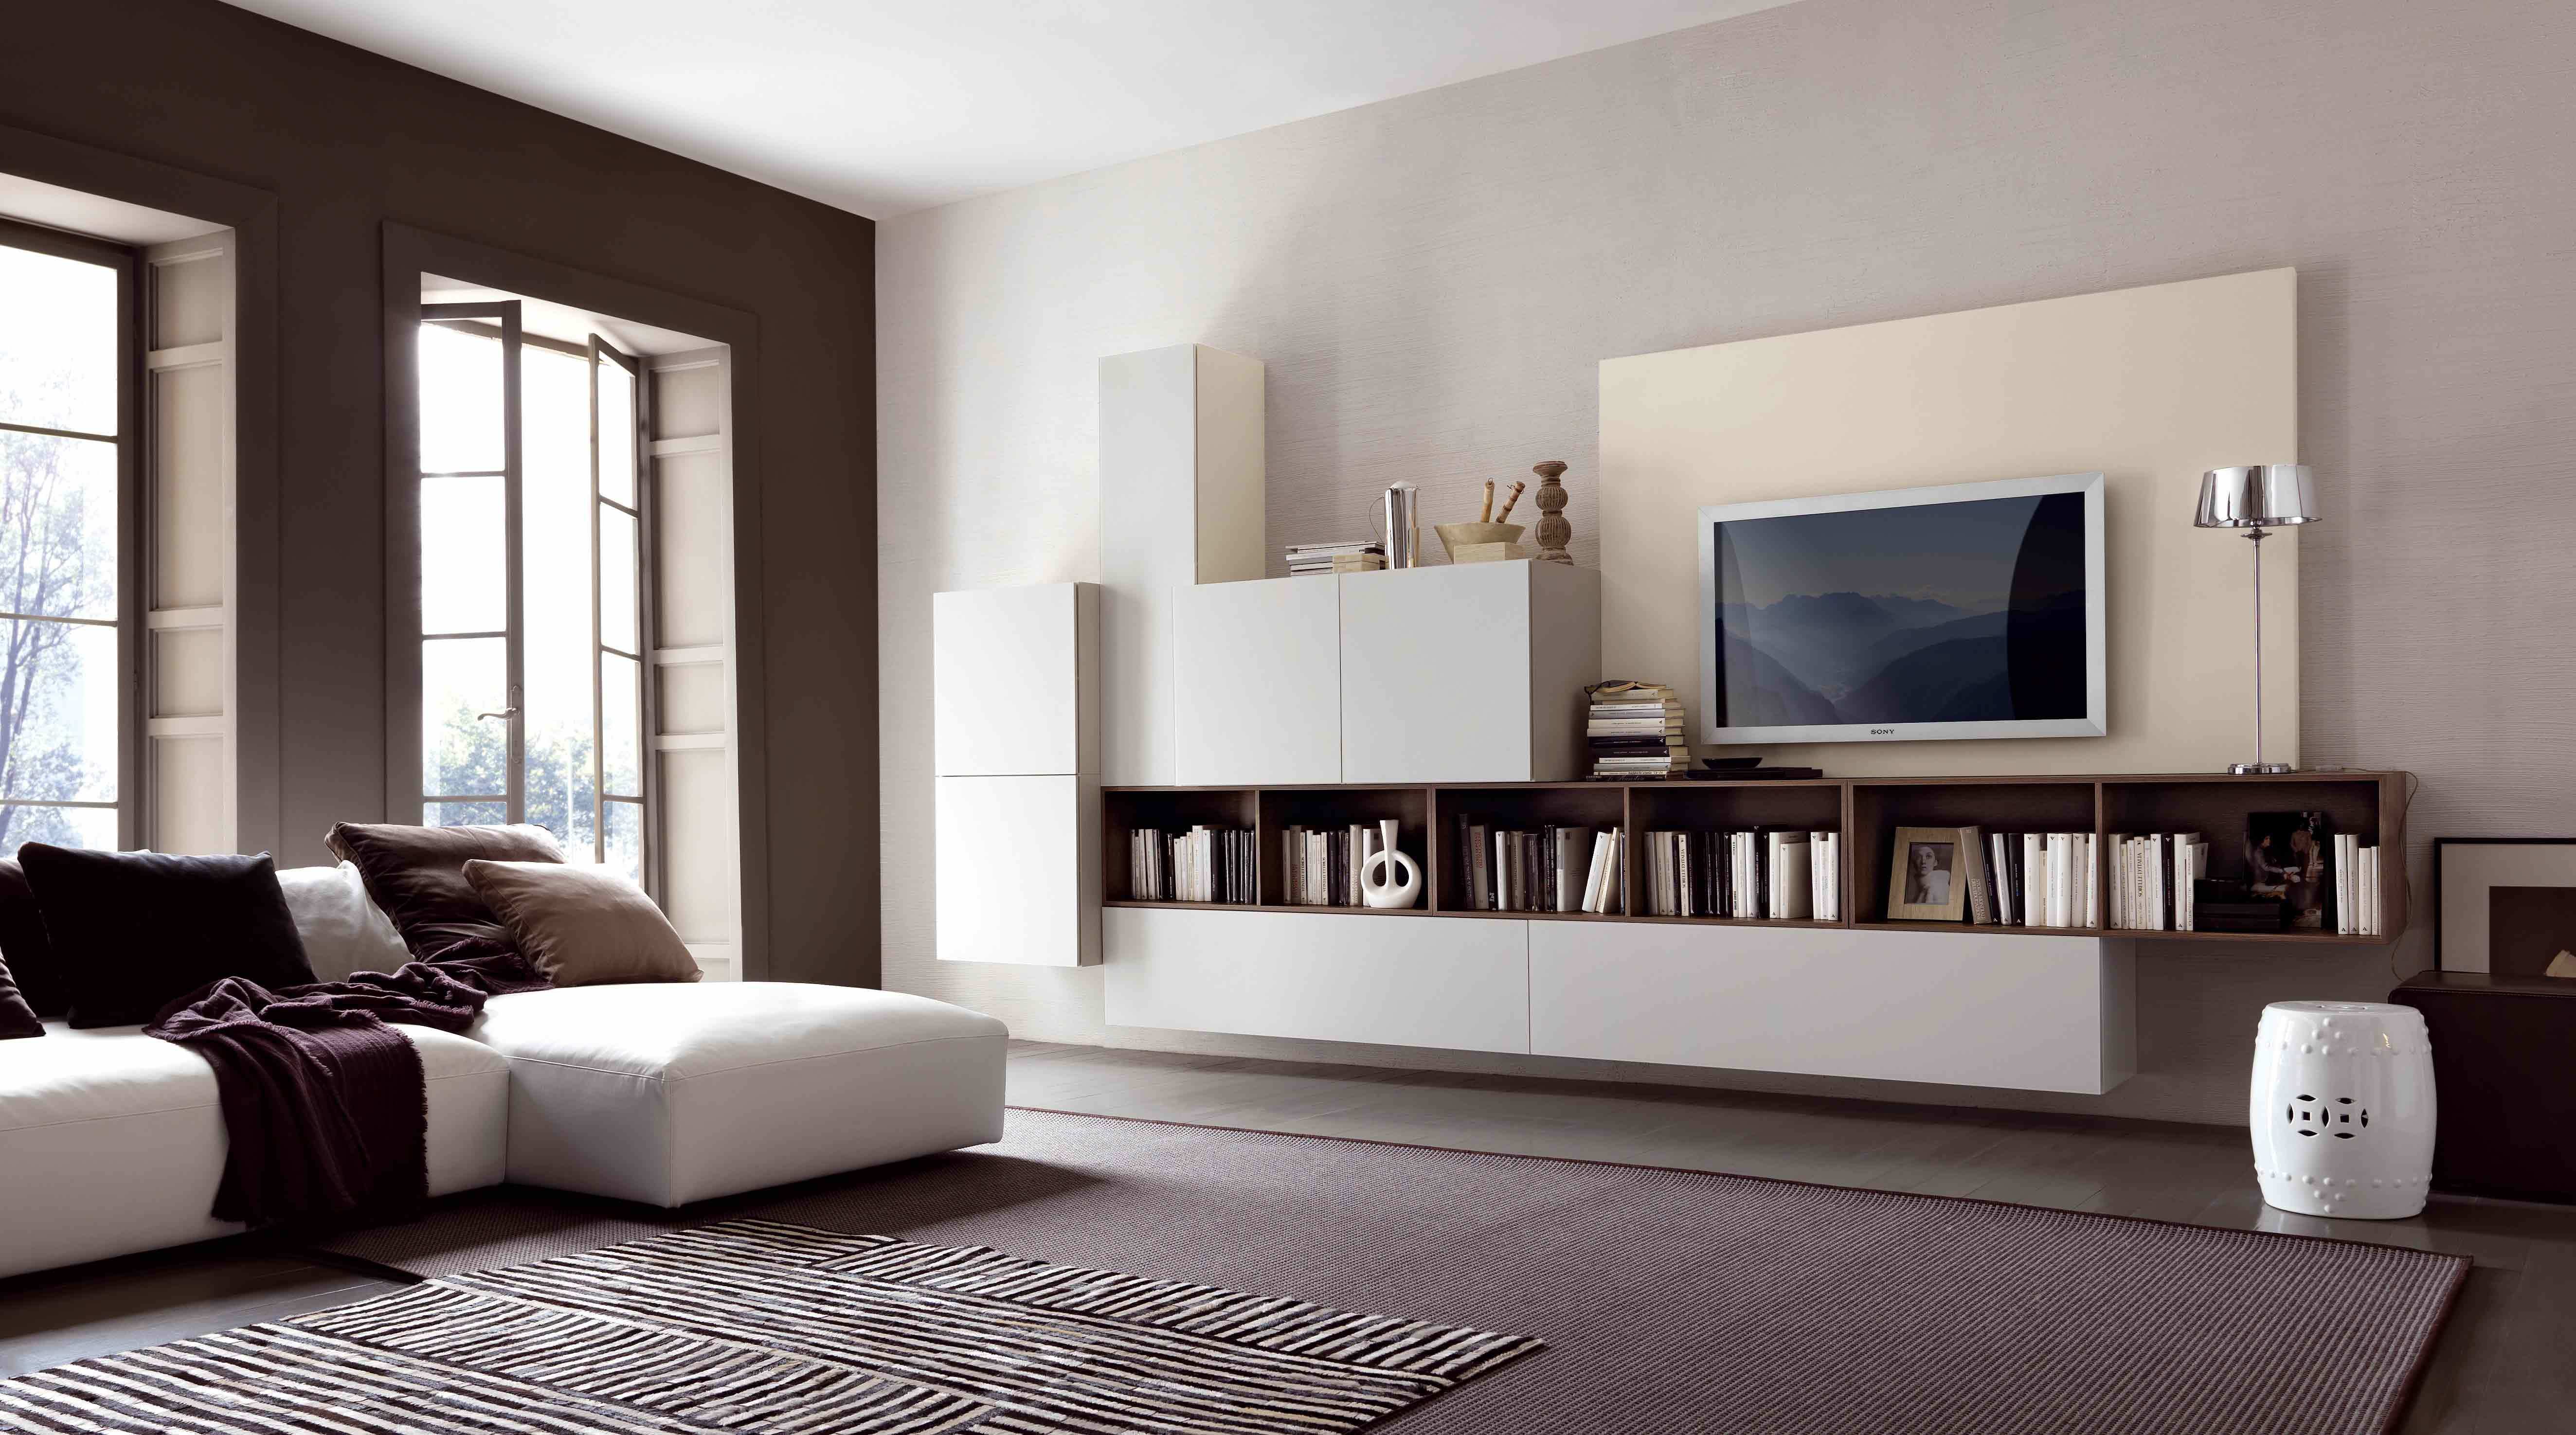 Mymobel iluminaci n modelo mueble de sal n colin precio 3450 espais etxea pinterest - Iluminacion para muebles ...